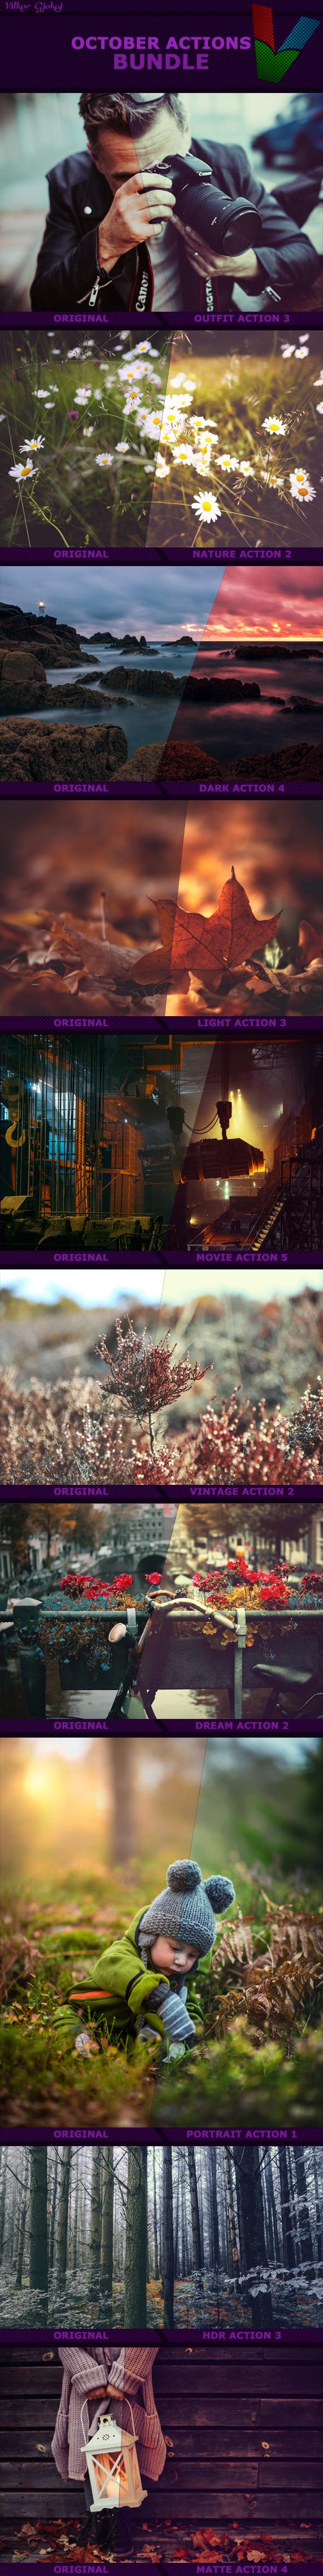 October Photoshop Actions Bundle